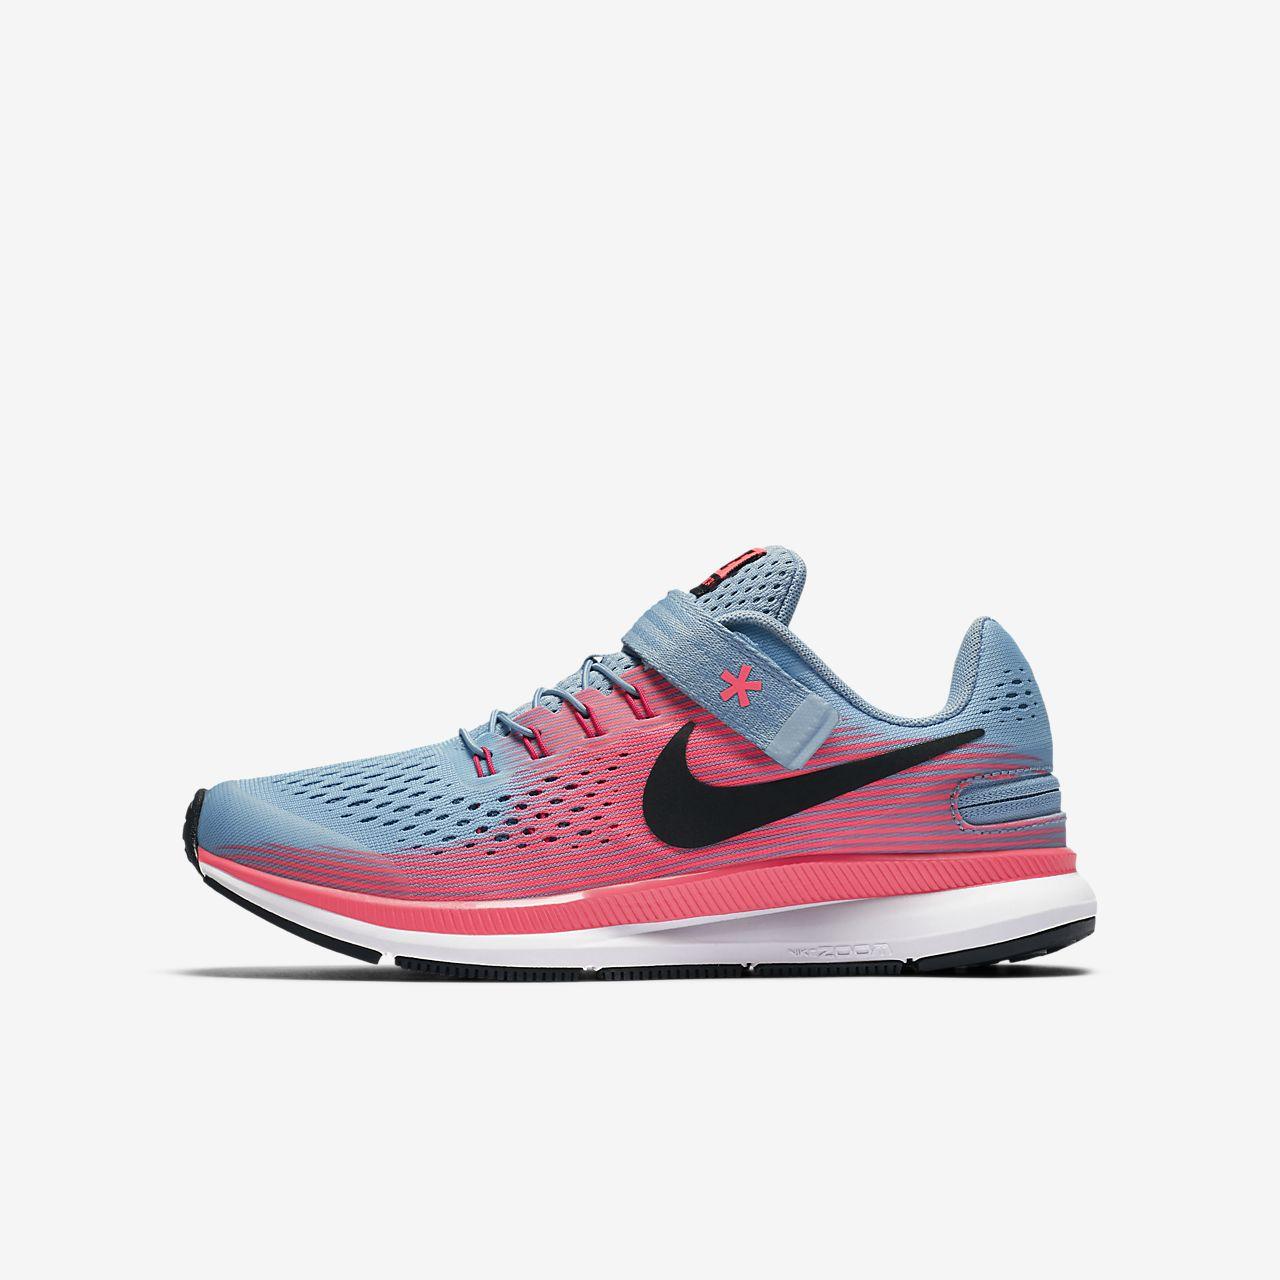 nike shoes pegasus 25198546 952539